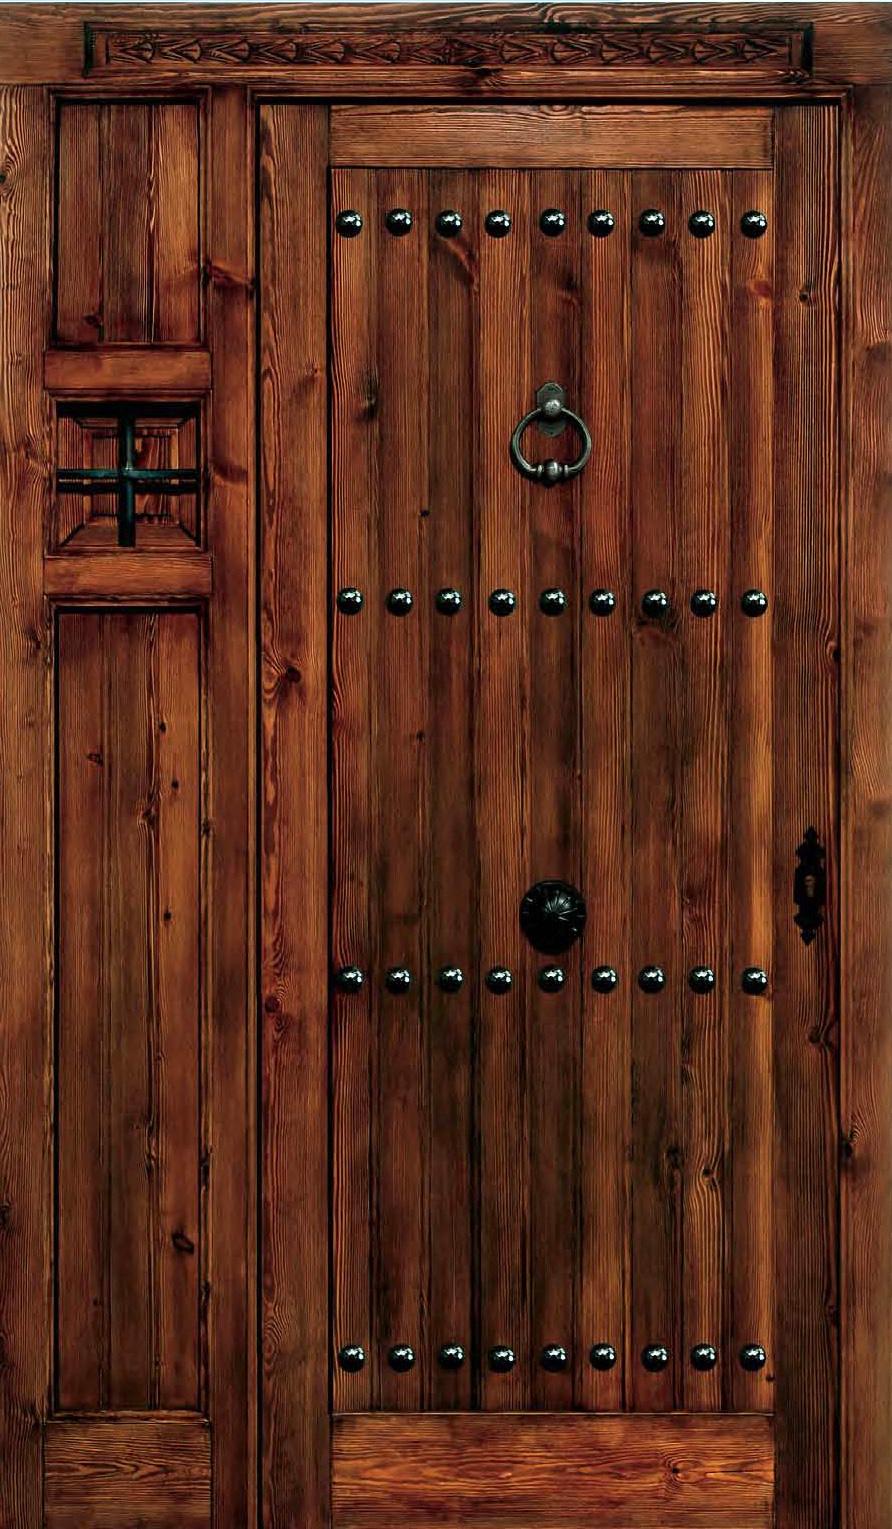 Puerta de madera rustica puerta de madera antigua tallada for Puertas rusticas de madera